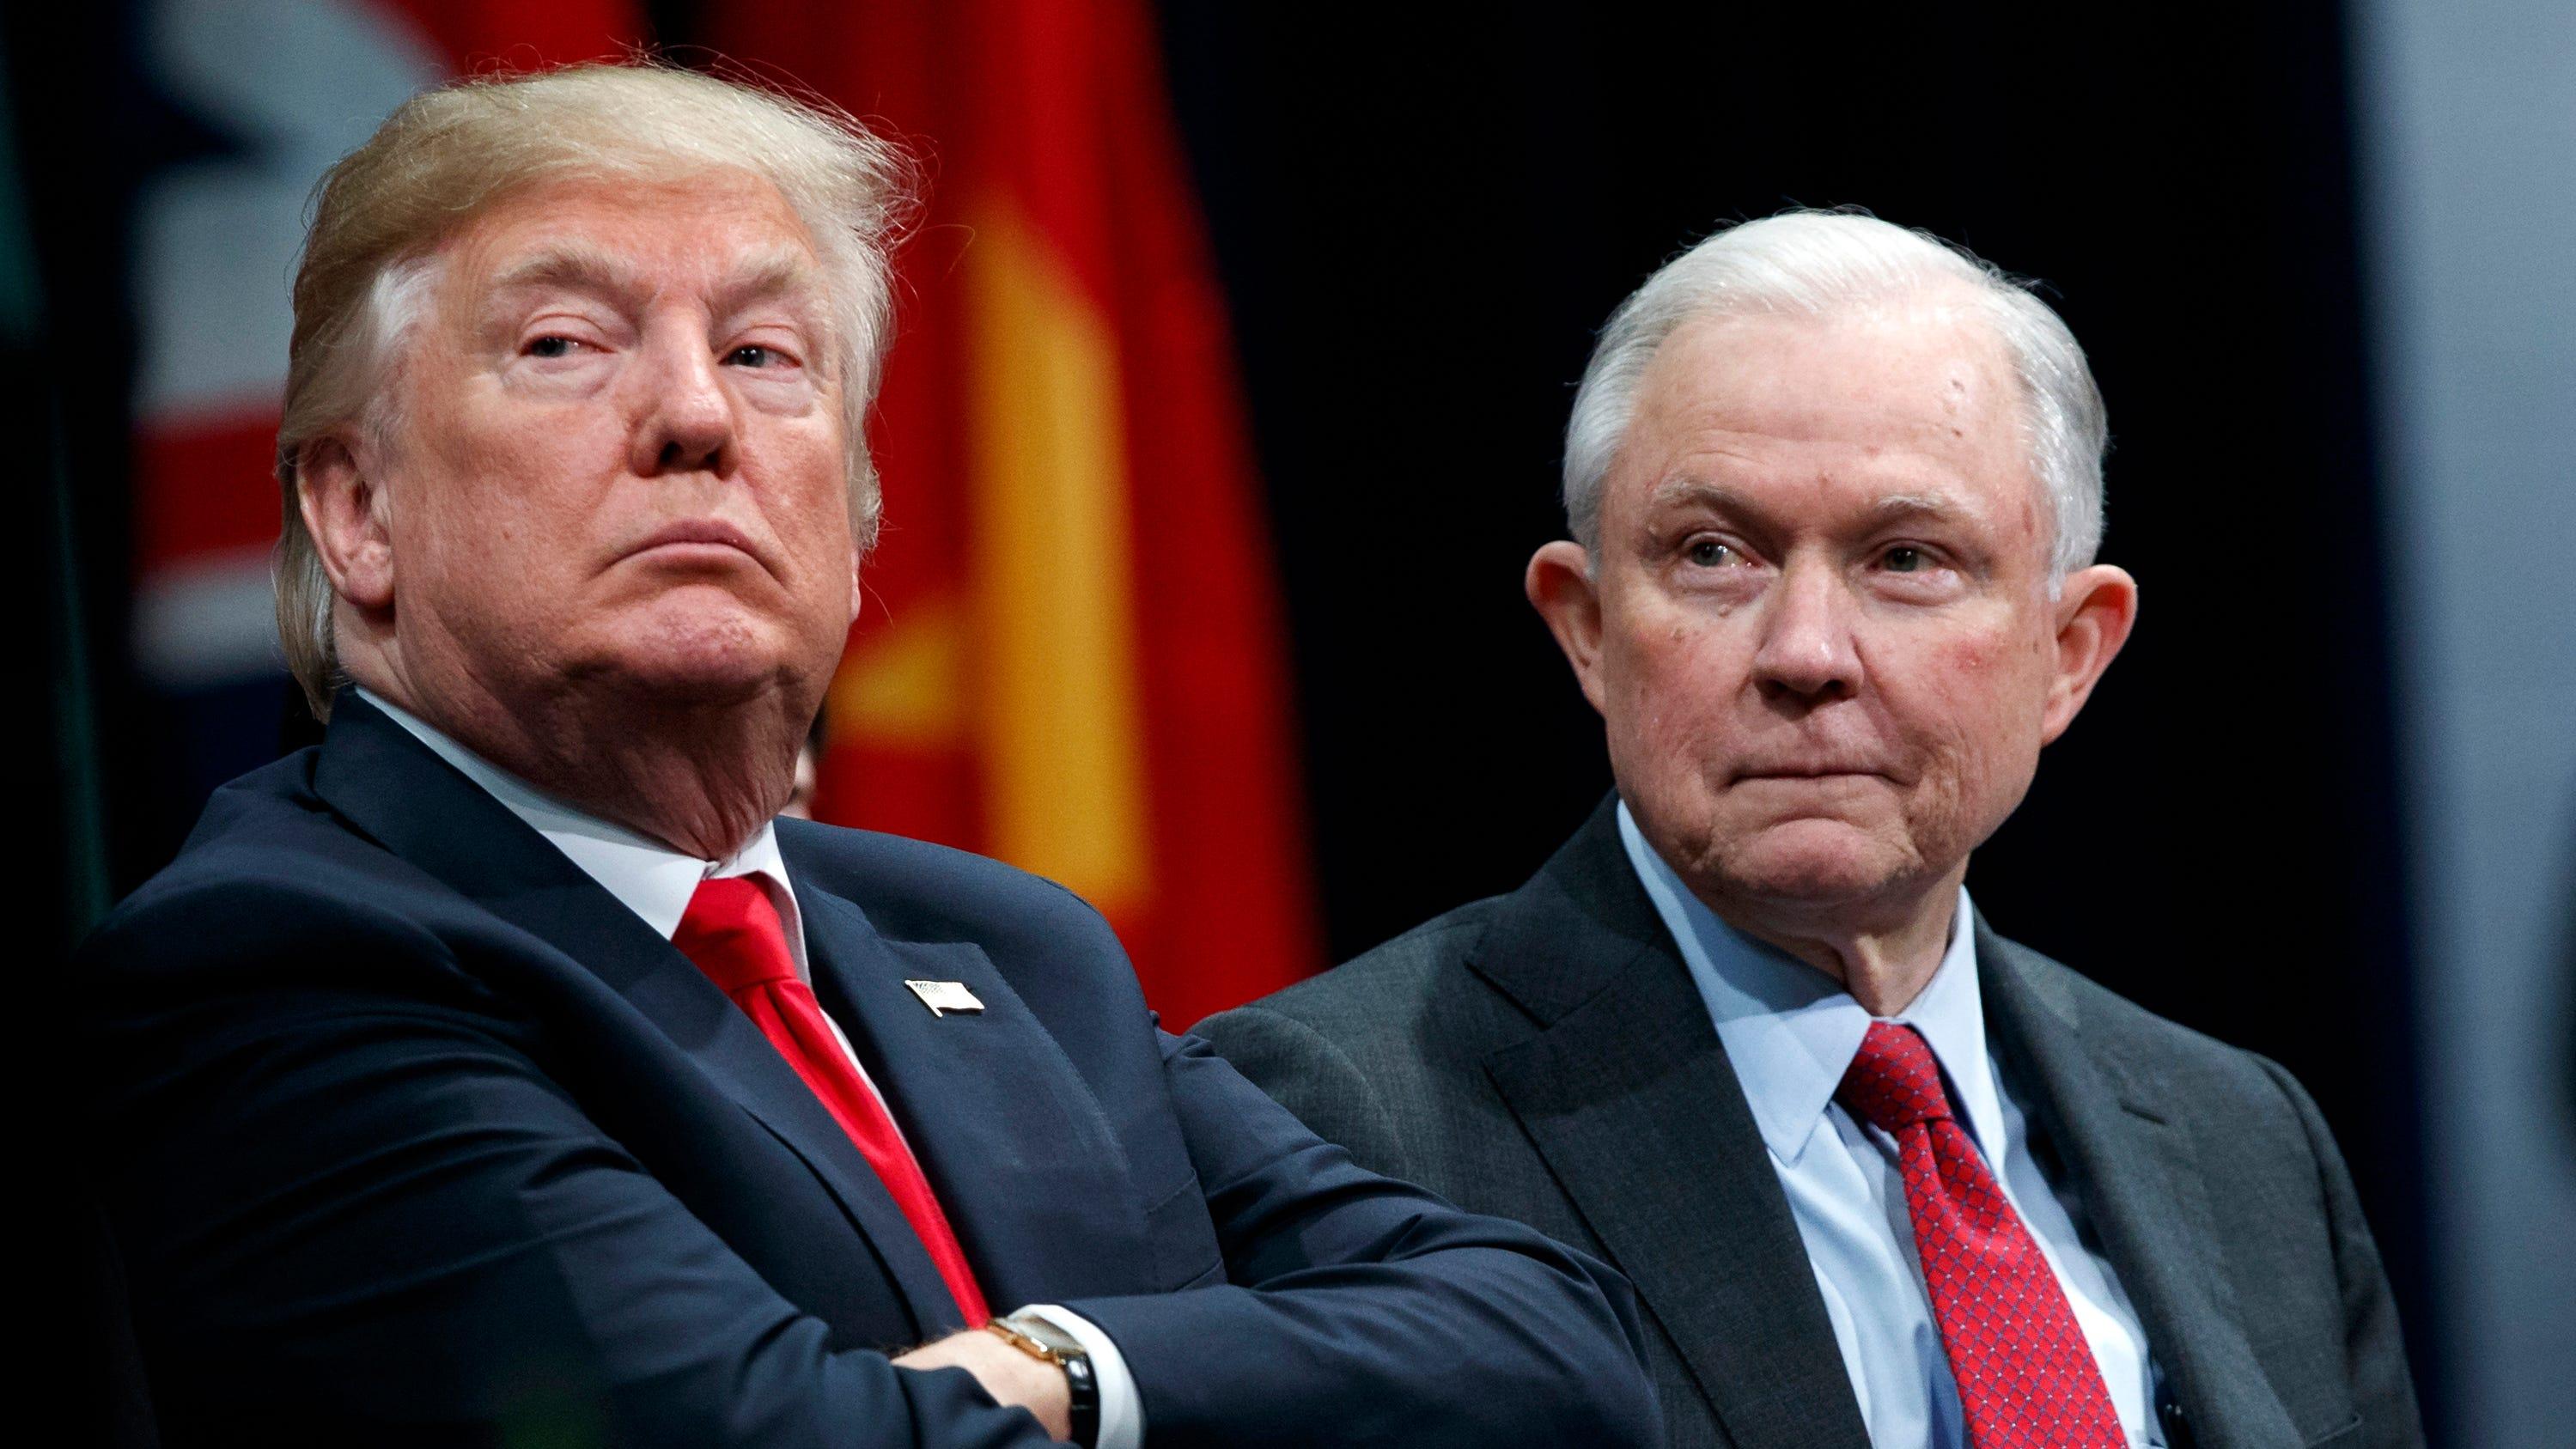 DOJ asks inspector general to investigate Trump Justice Department's seizure of Democrats' phone data